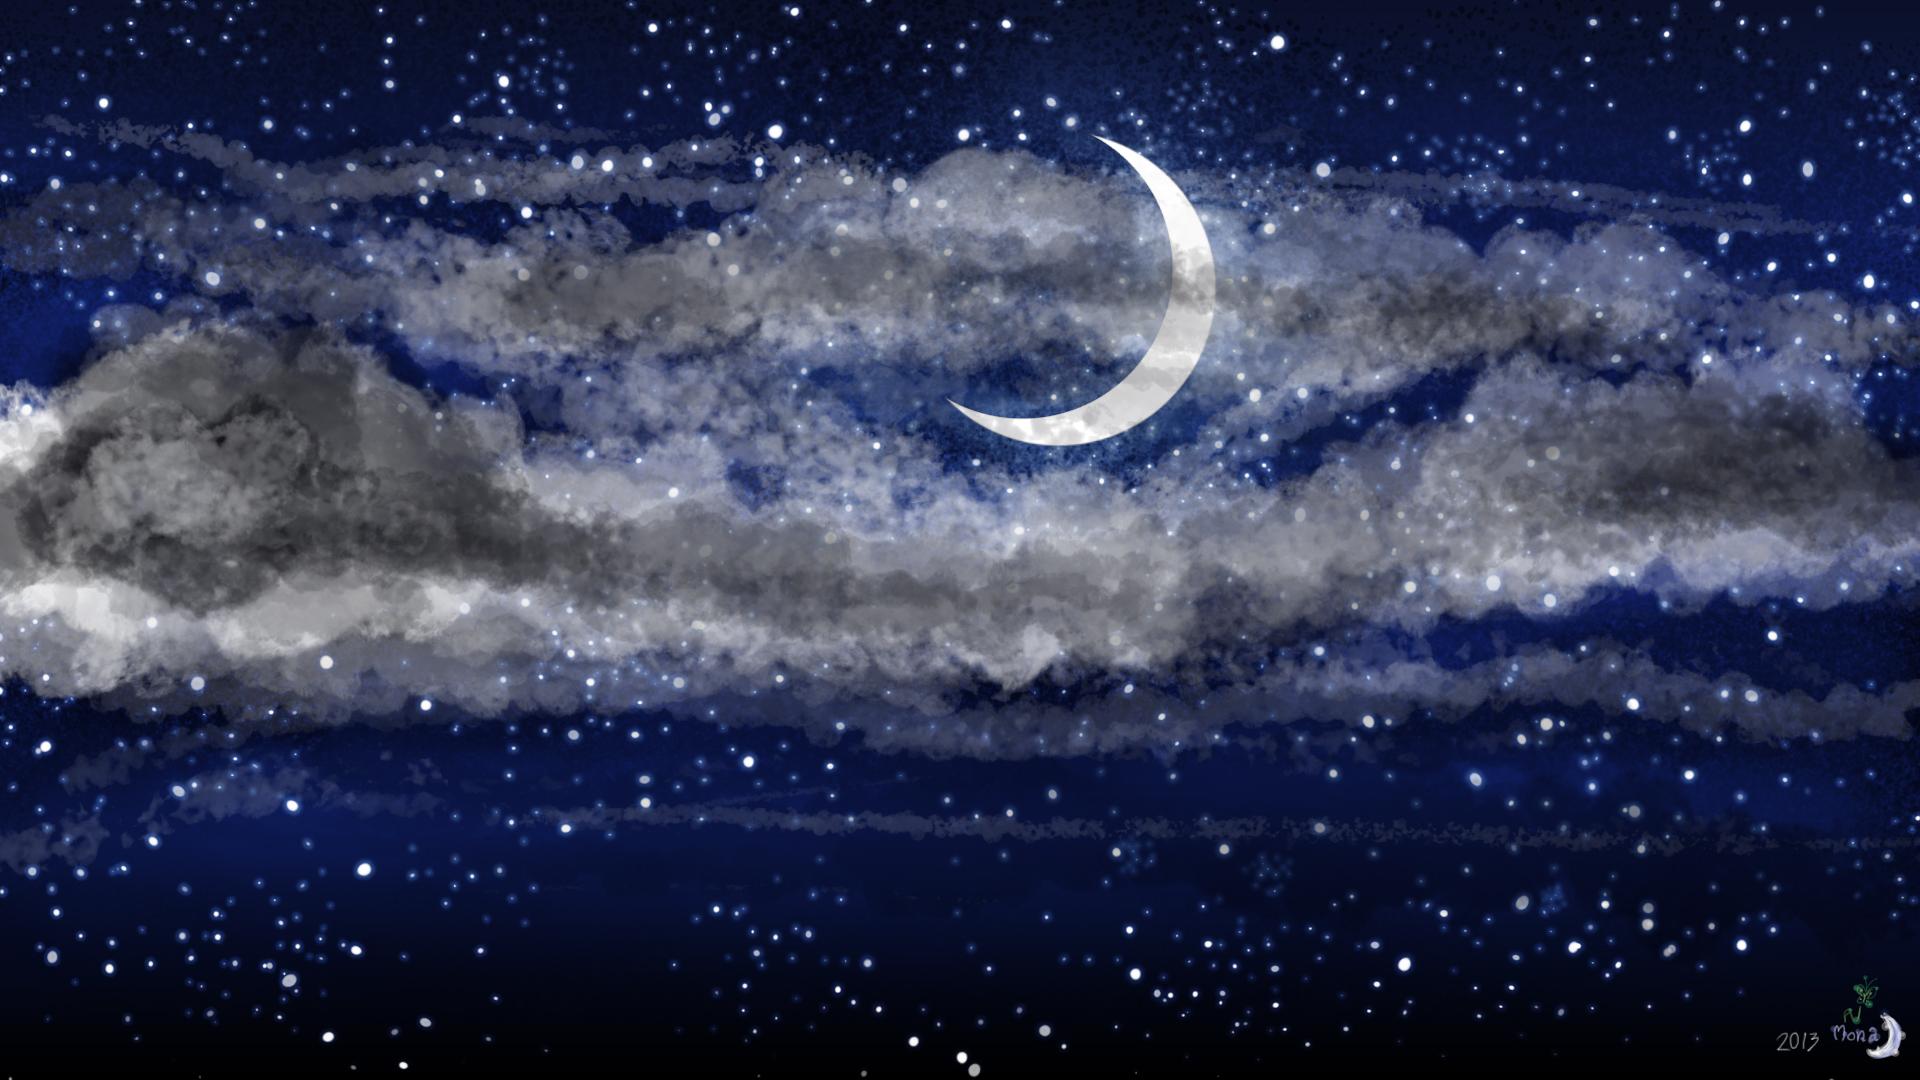 moon and stars wallpaper wallpapersafari